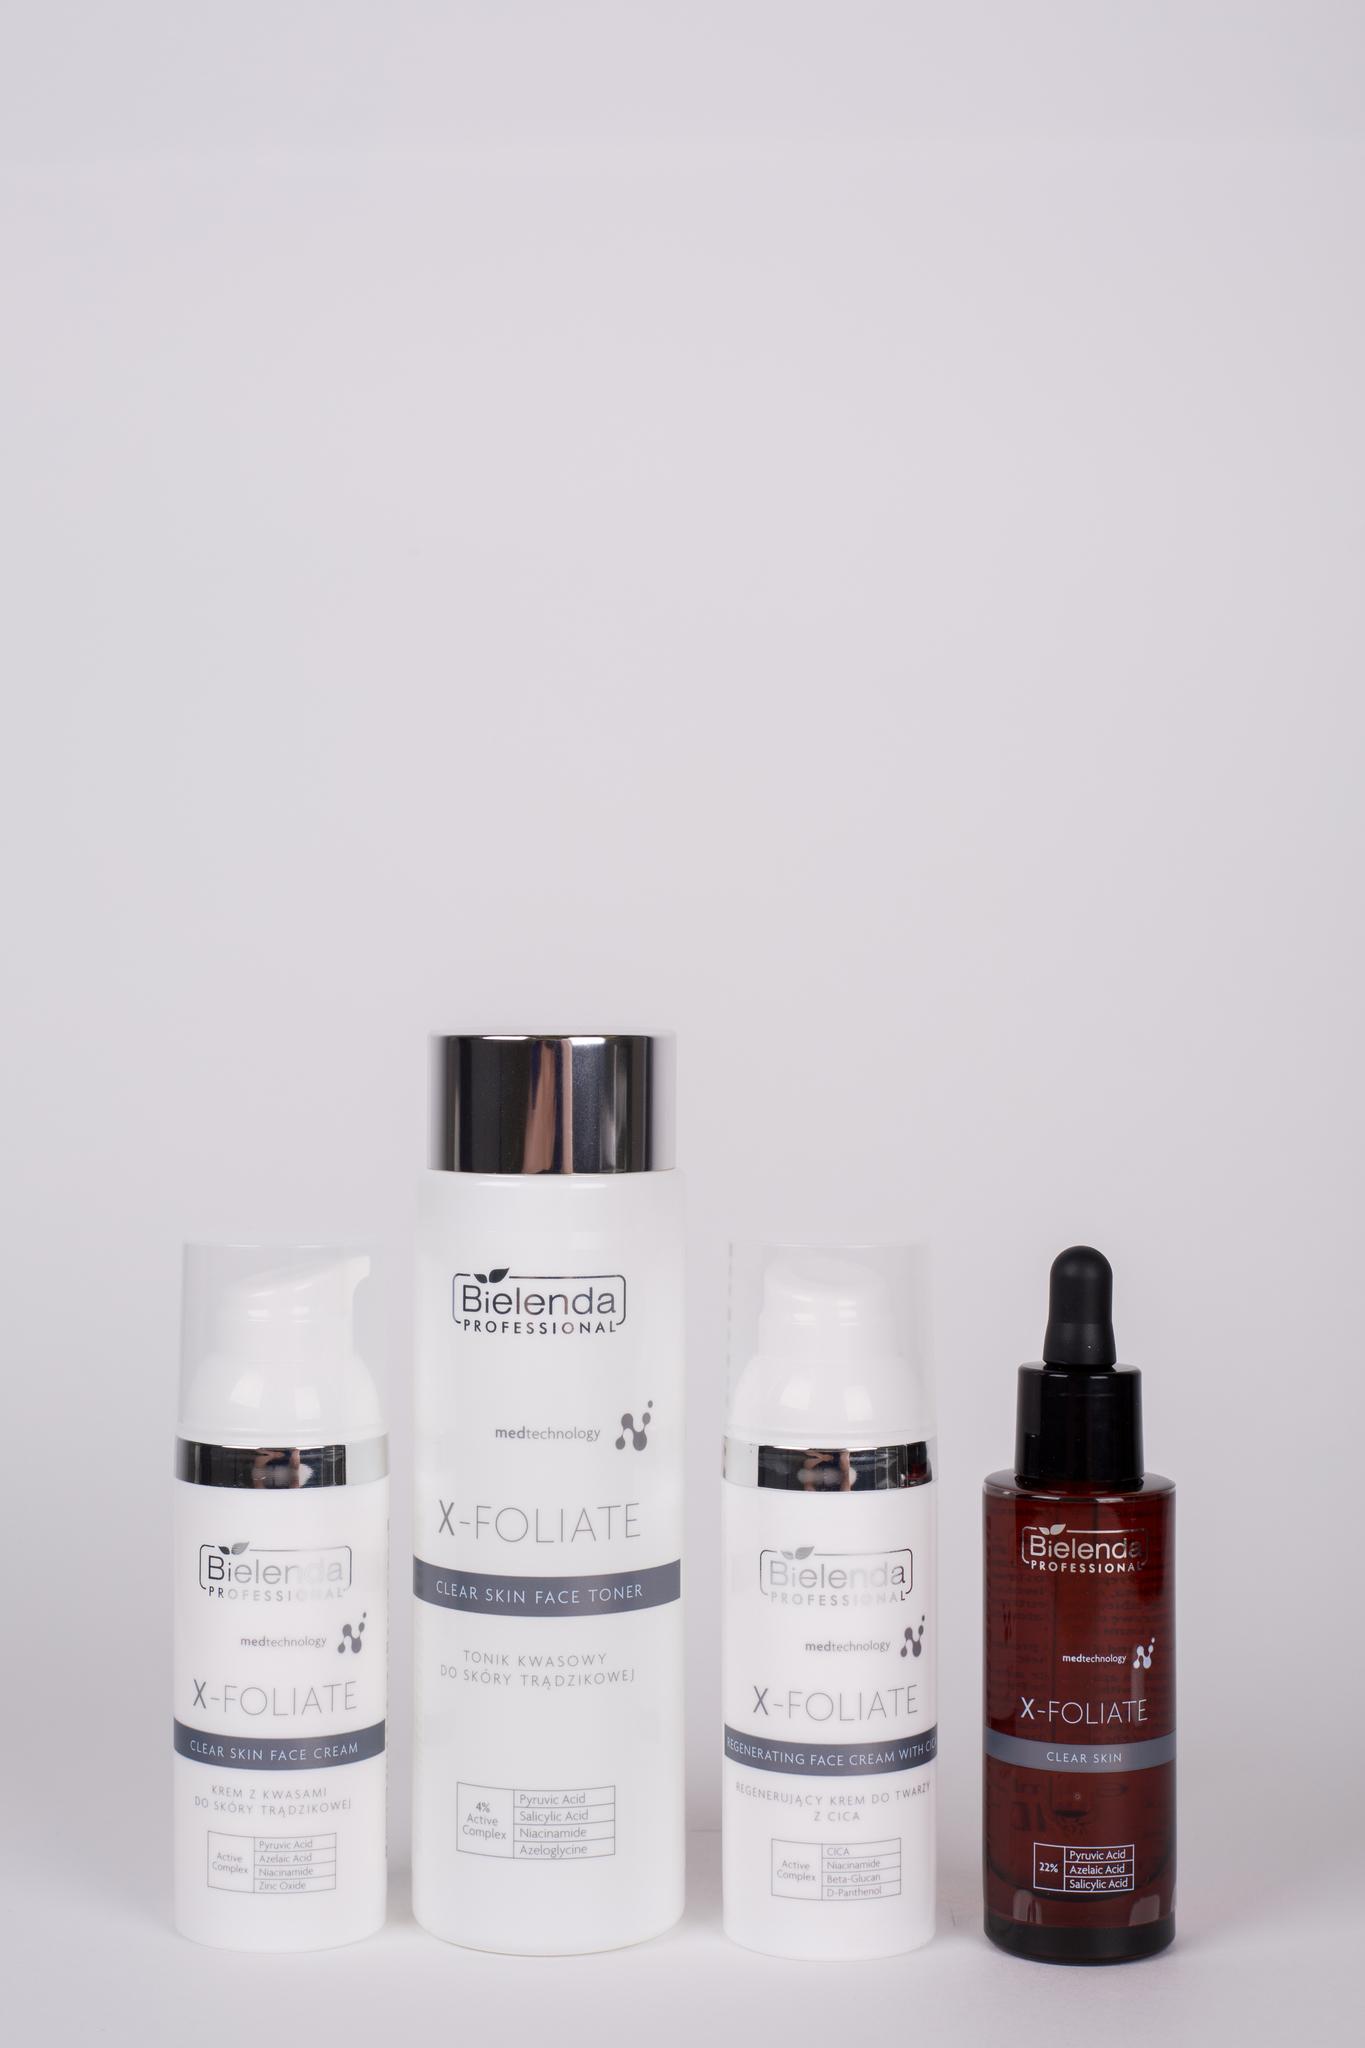 X-FOLIATE Clear Skin Тоник для лица  с кислотами для жирной кожи, 200 мл.